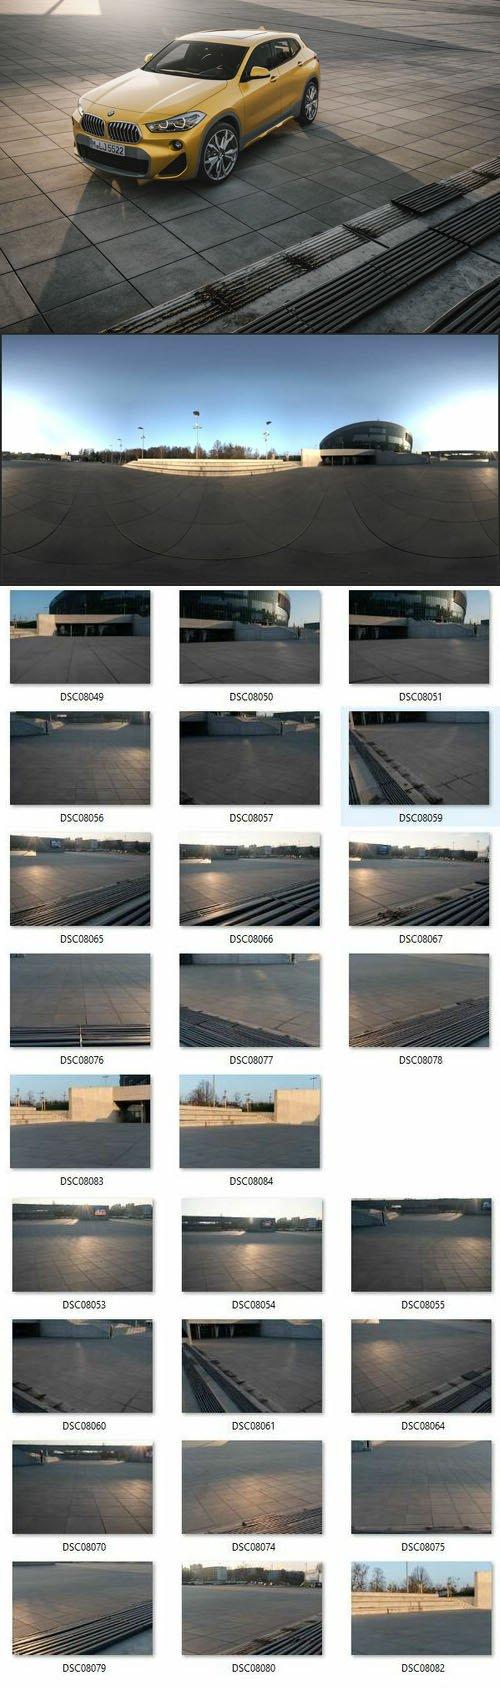 Stadium HDRi + 26 Backplates